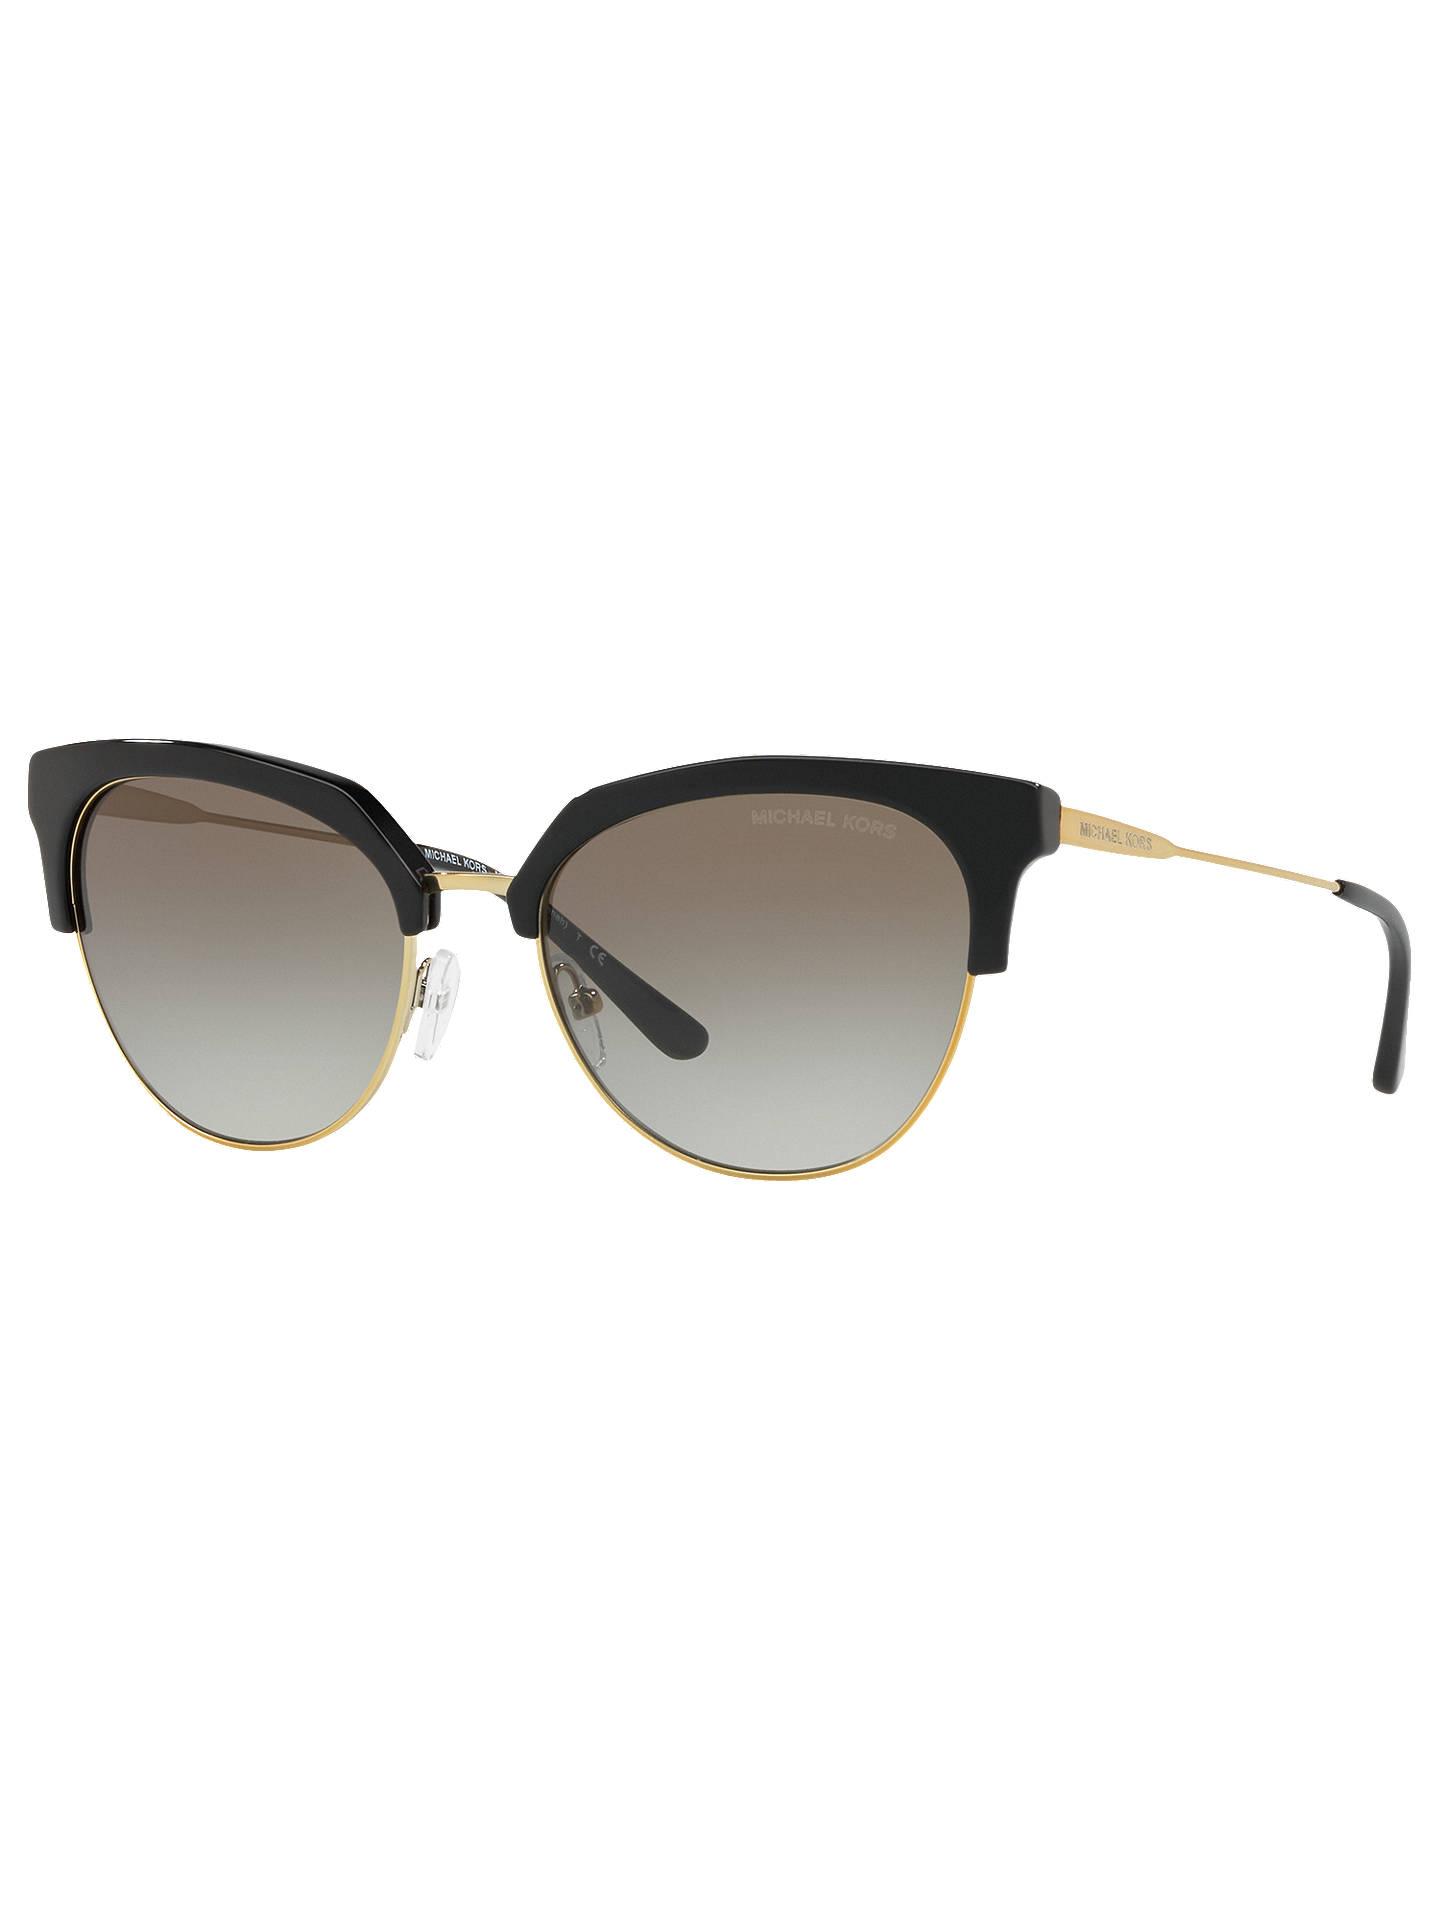 6c1167512885 Buy Michael Kors MK1033 Women s Savannah Cat s Eye Sunglasses